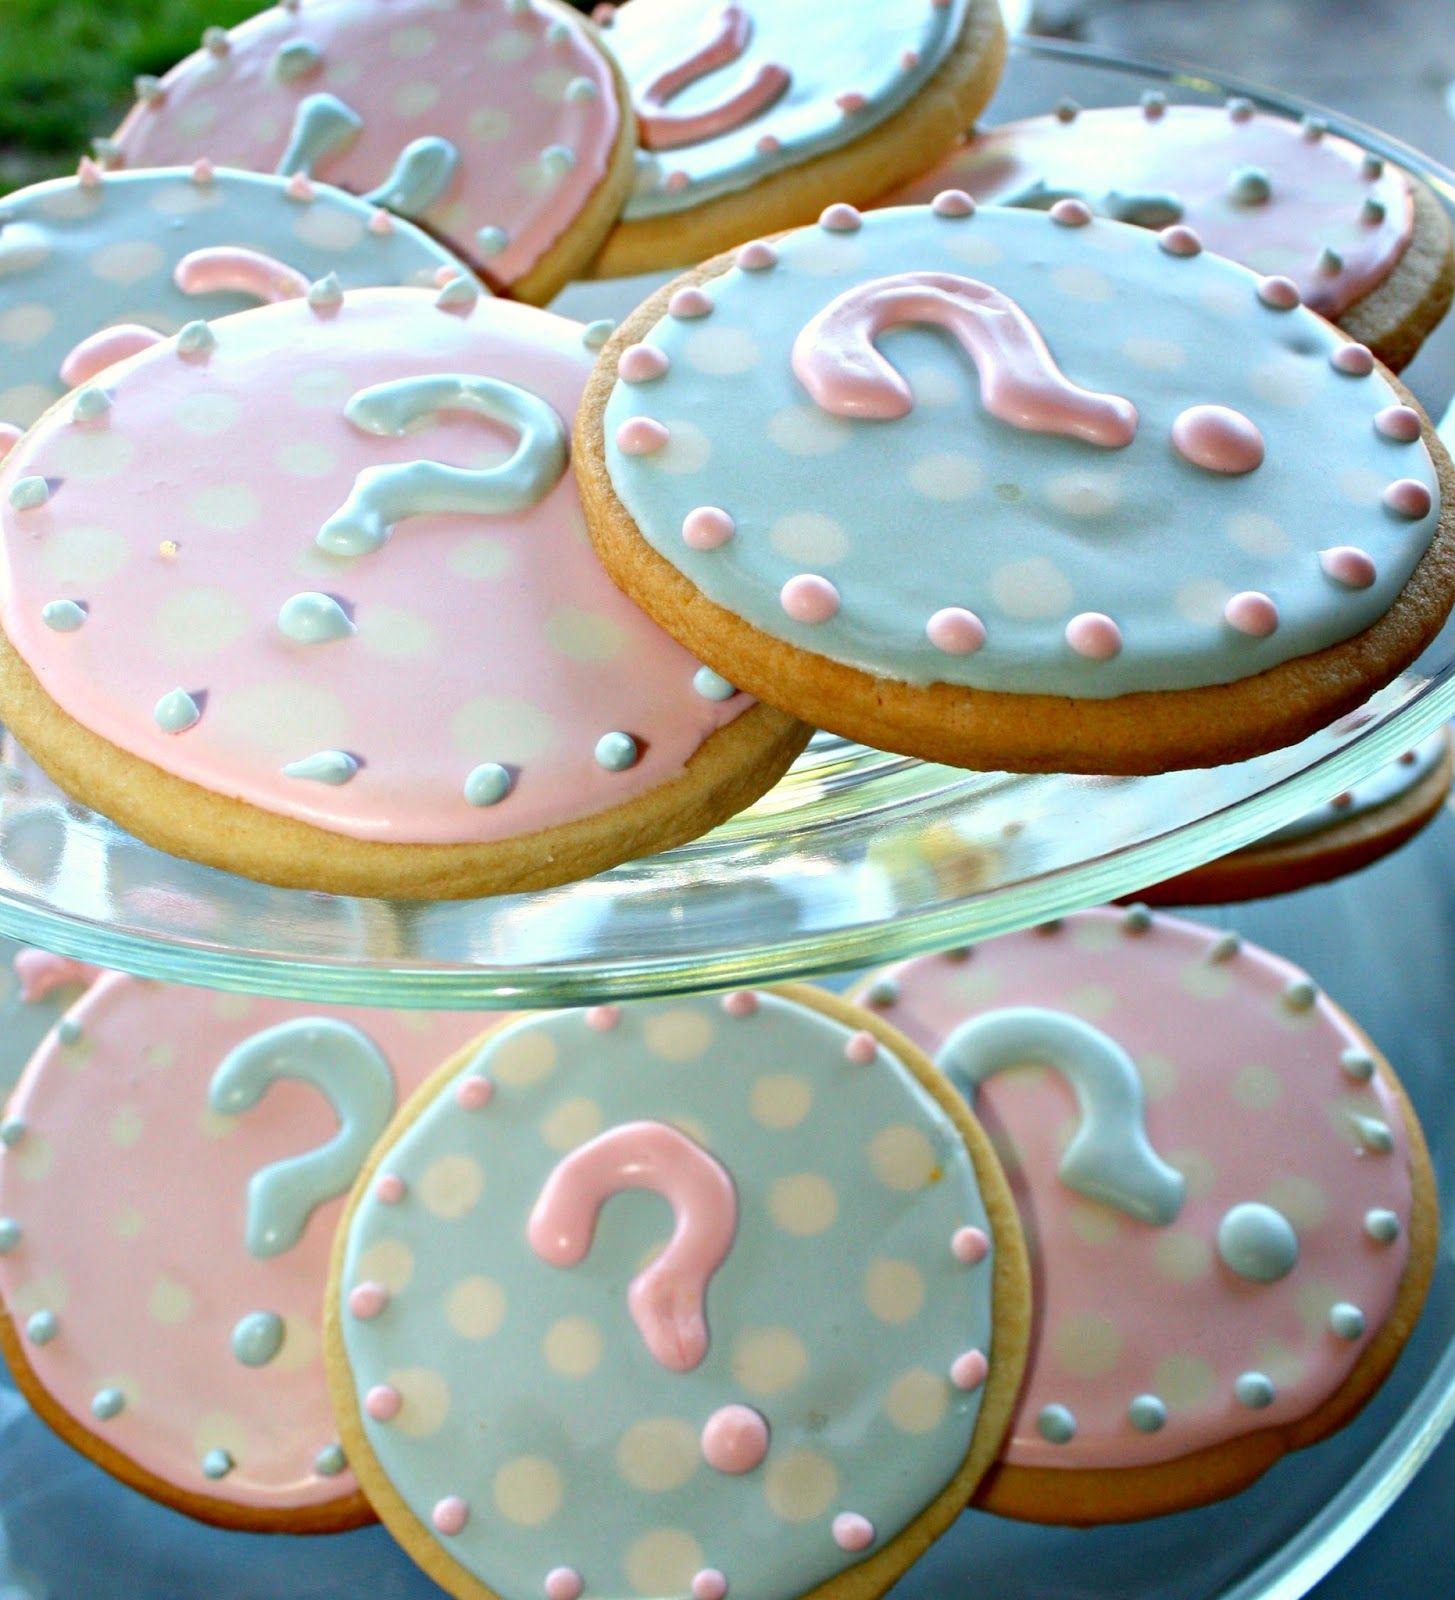 Fancy Gender Reveal Snacks | Yogurt pretzels, Pretzels and Yogurt